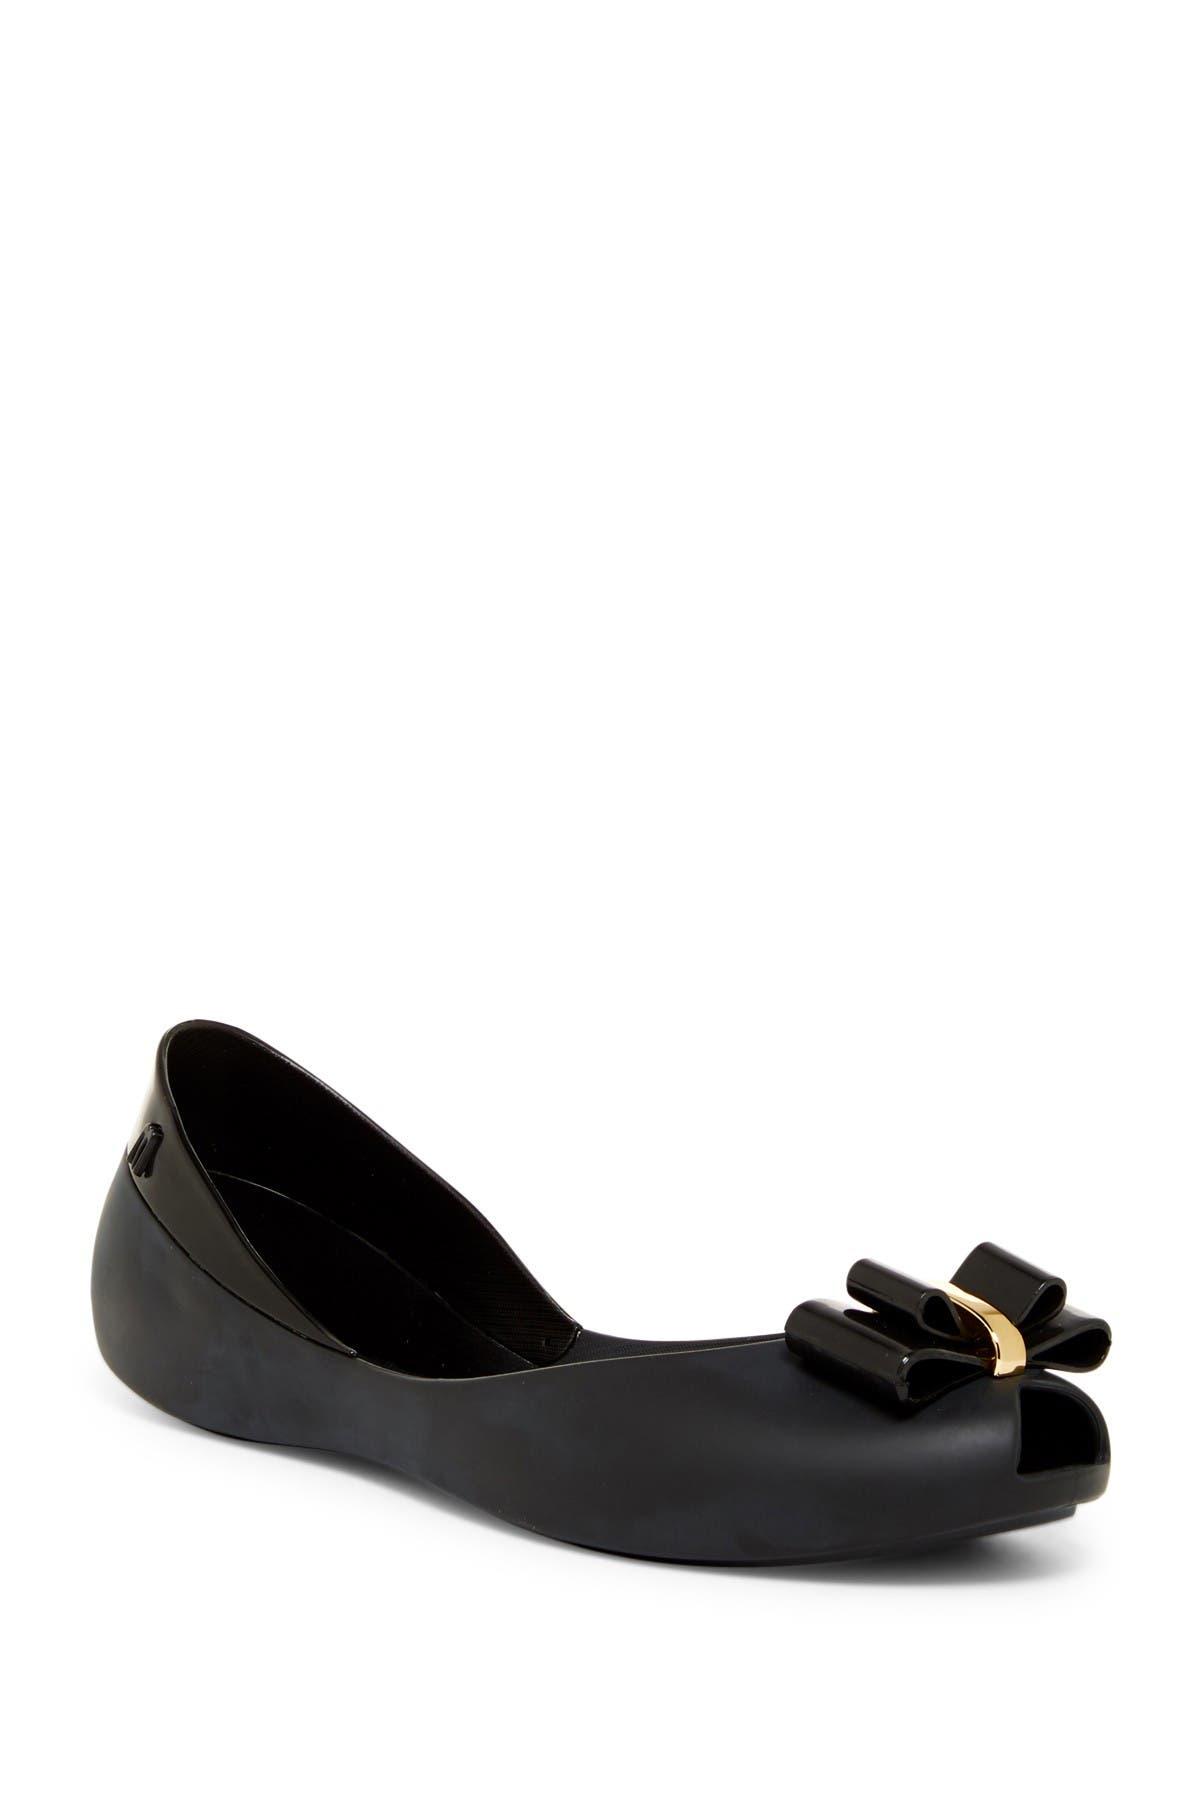 Image of Melissa Queen V Peep Toe Flat